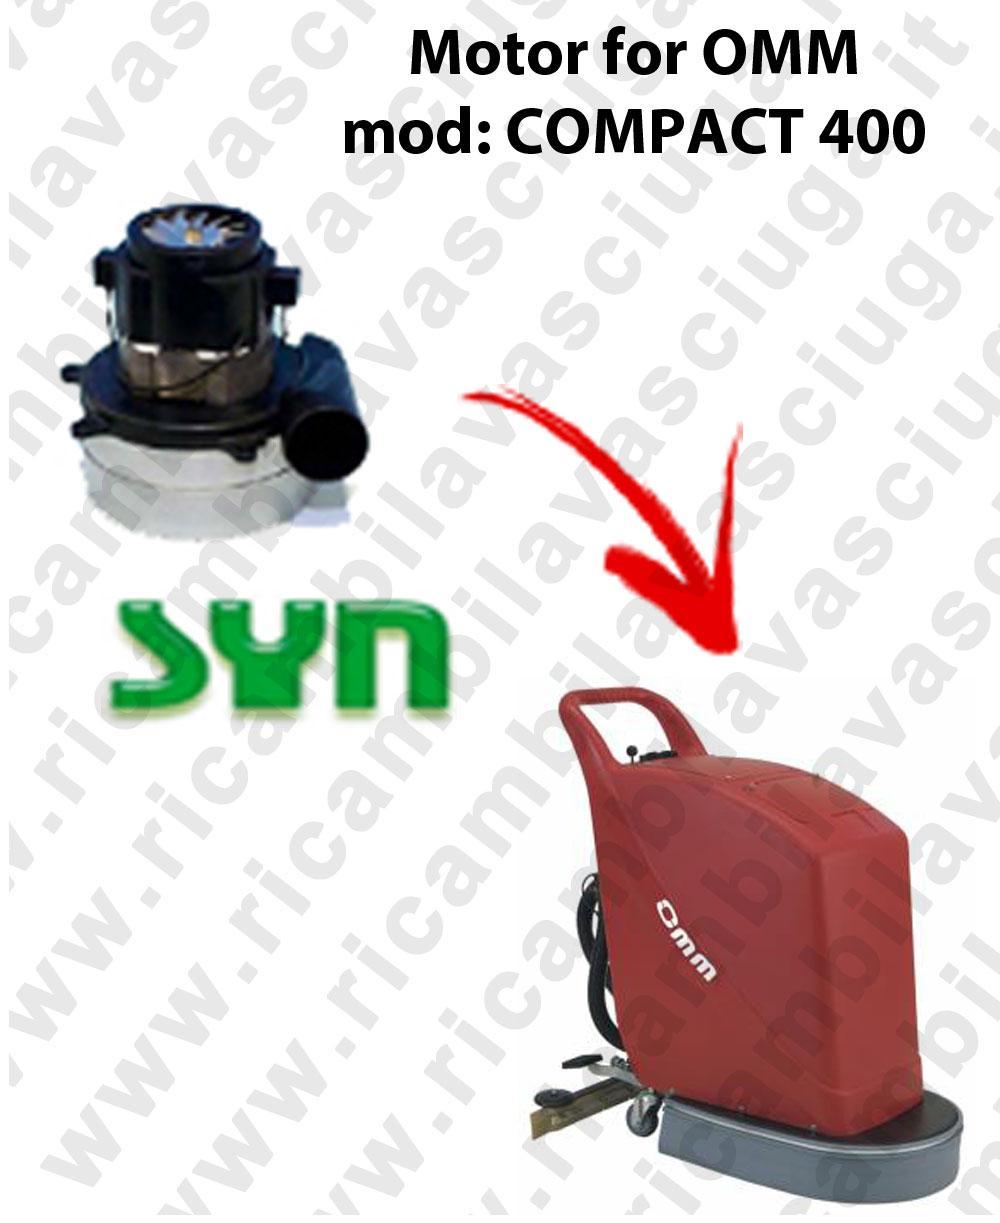 COMPACT 400 Saugmotor SYNCLEAN für scheuersaugmaschinen OMM